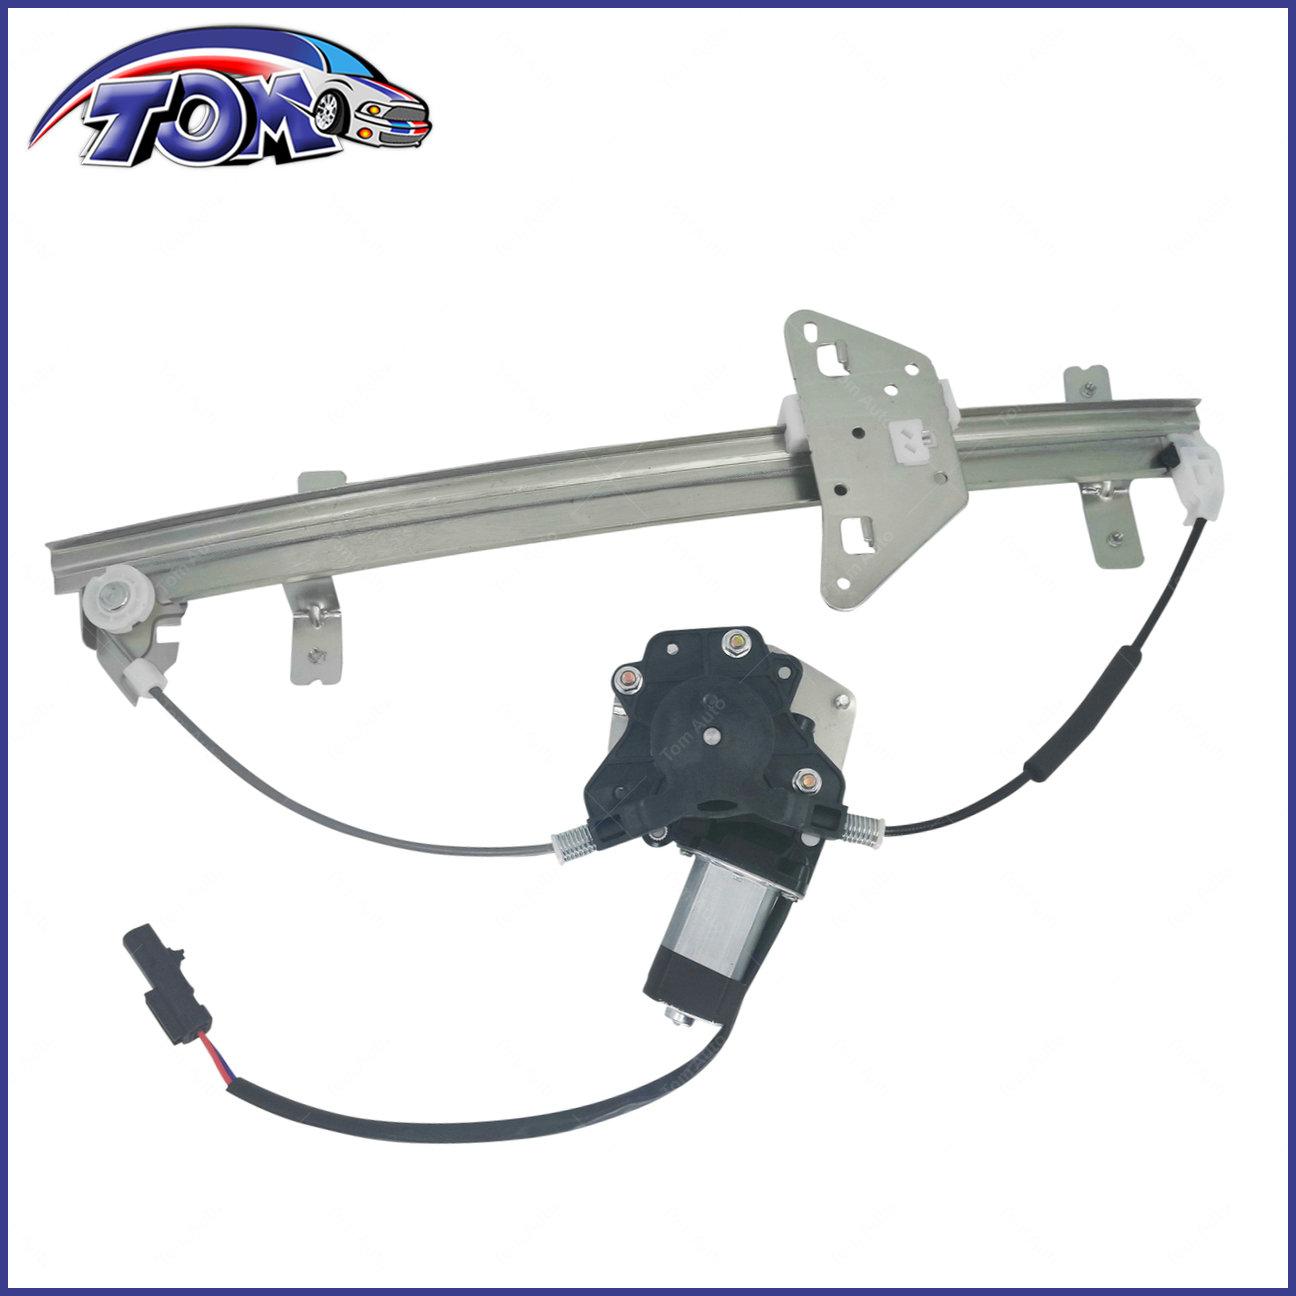 Dorman 741-598 Rear Driver Side Replacement Power Window Regulator with Motor for Dodge Dakota//Durango